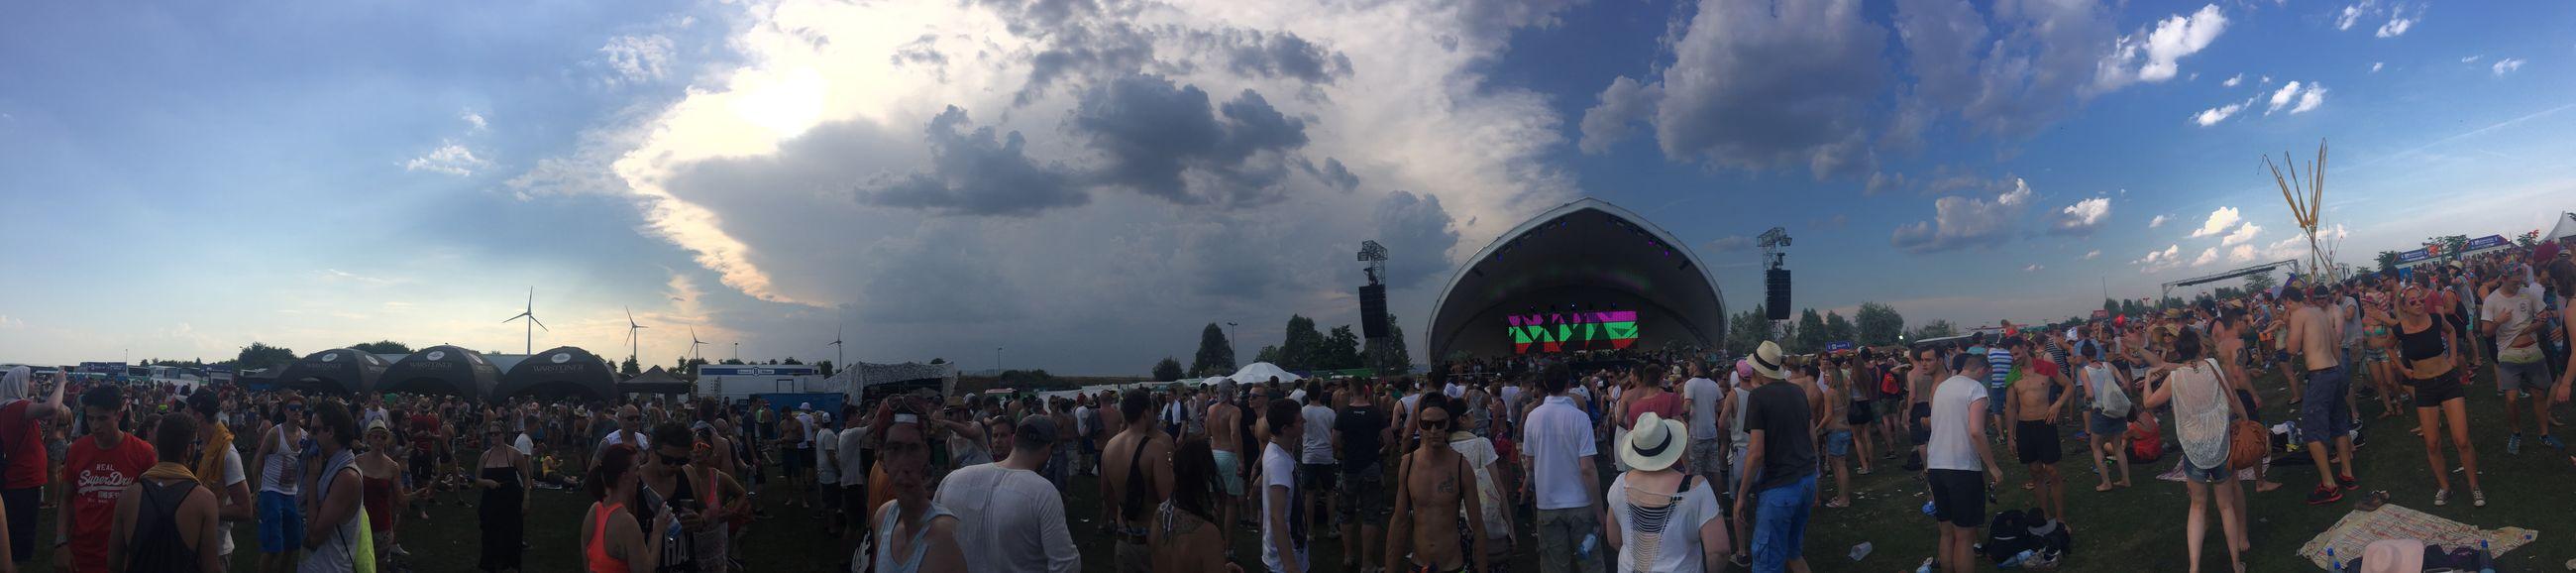 Love Electro Festival Sun Clouds Bestdayever